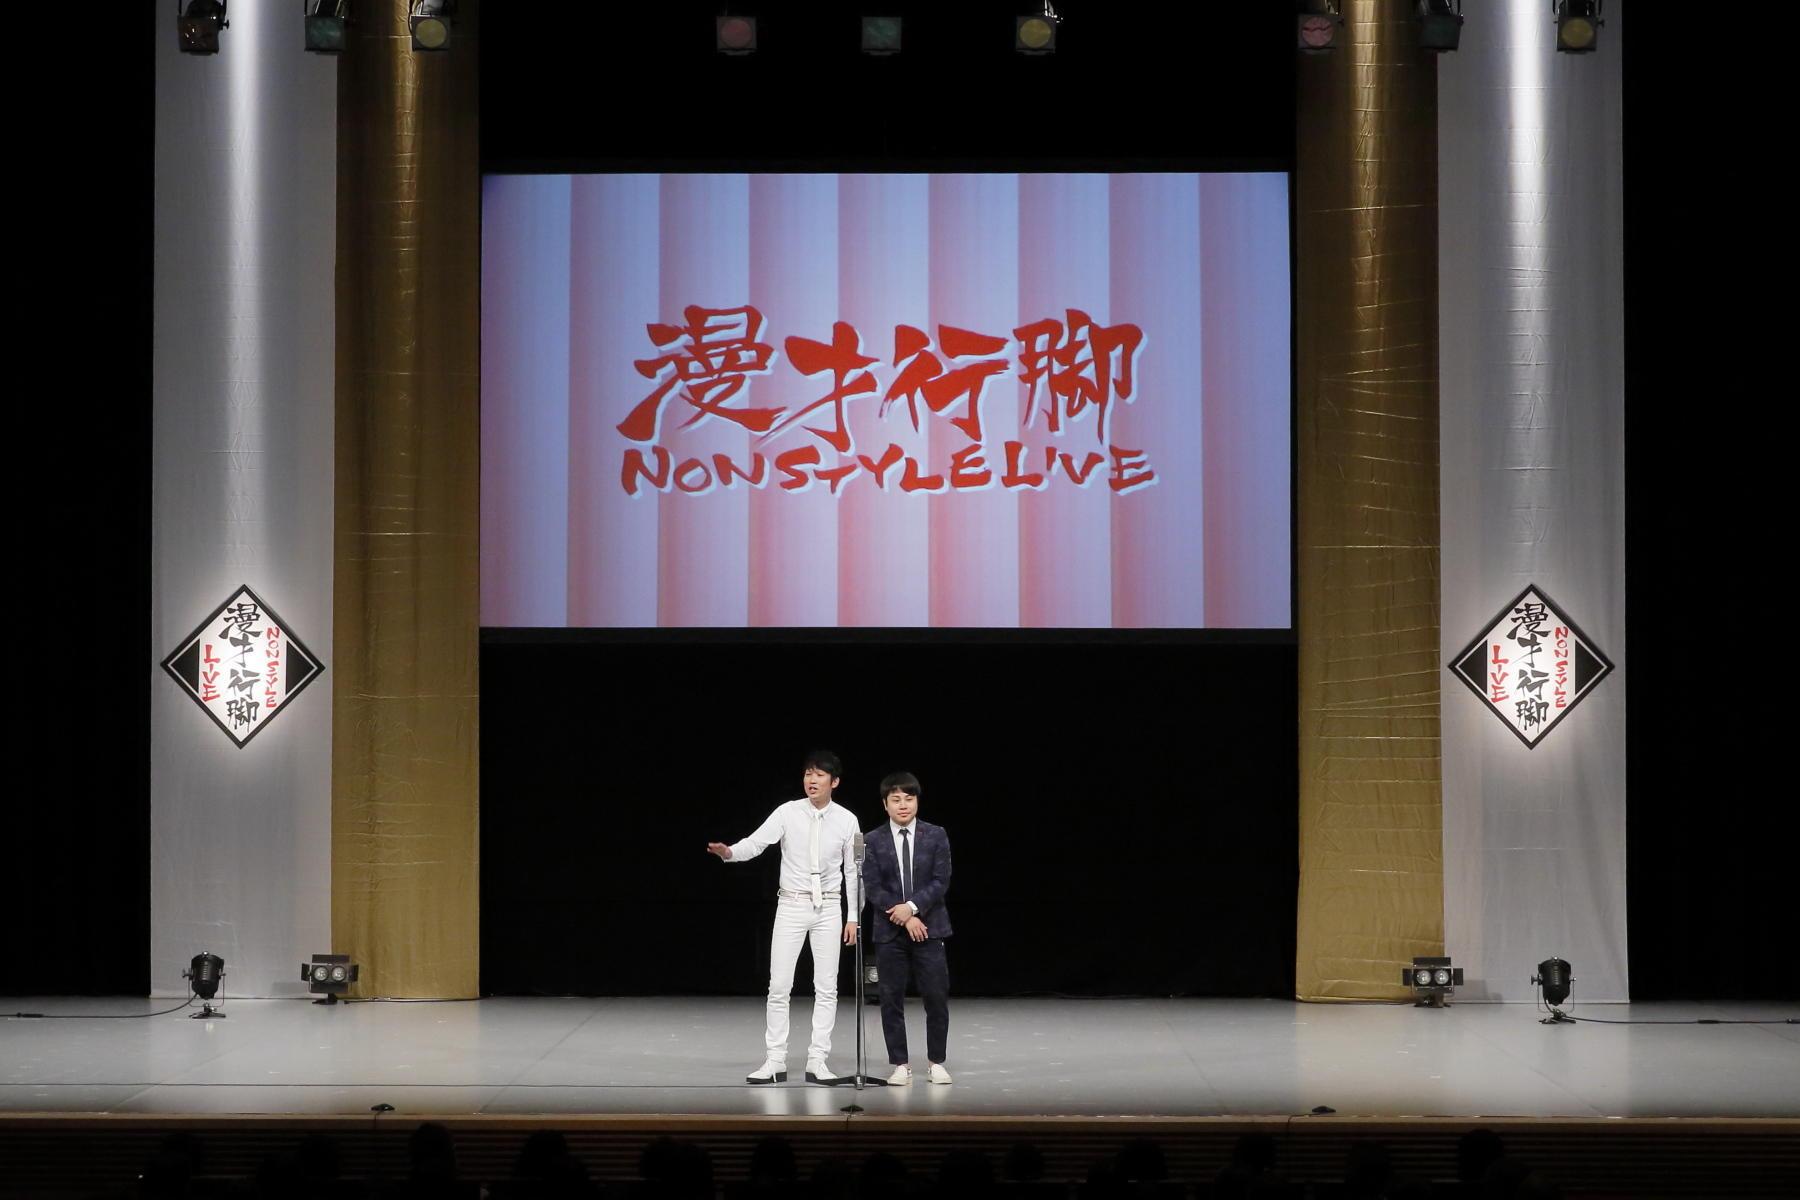 http://news.yoshimoto.co.jp/20171112123950-b2ce78a0219e98573784b7eba8acea7b26760507.jpg